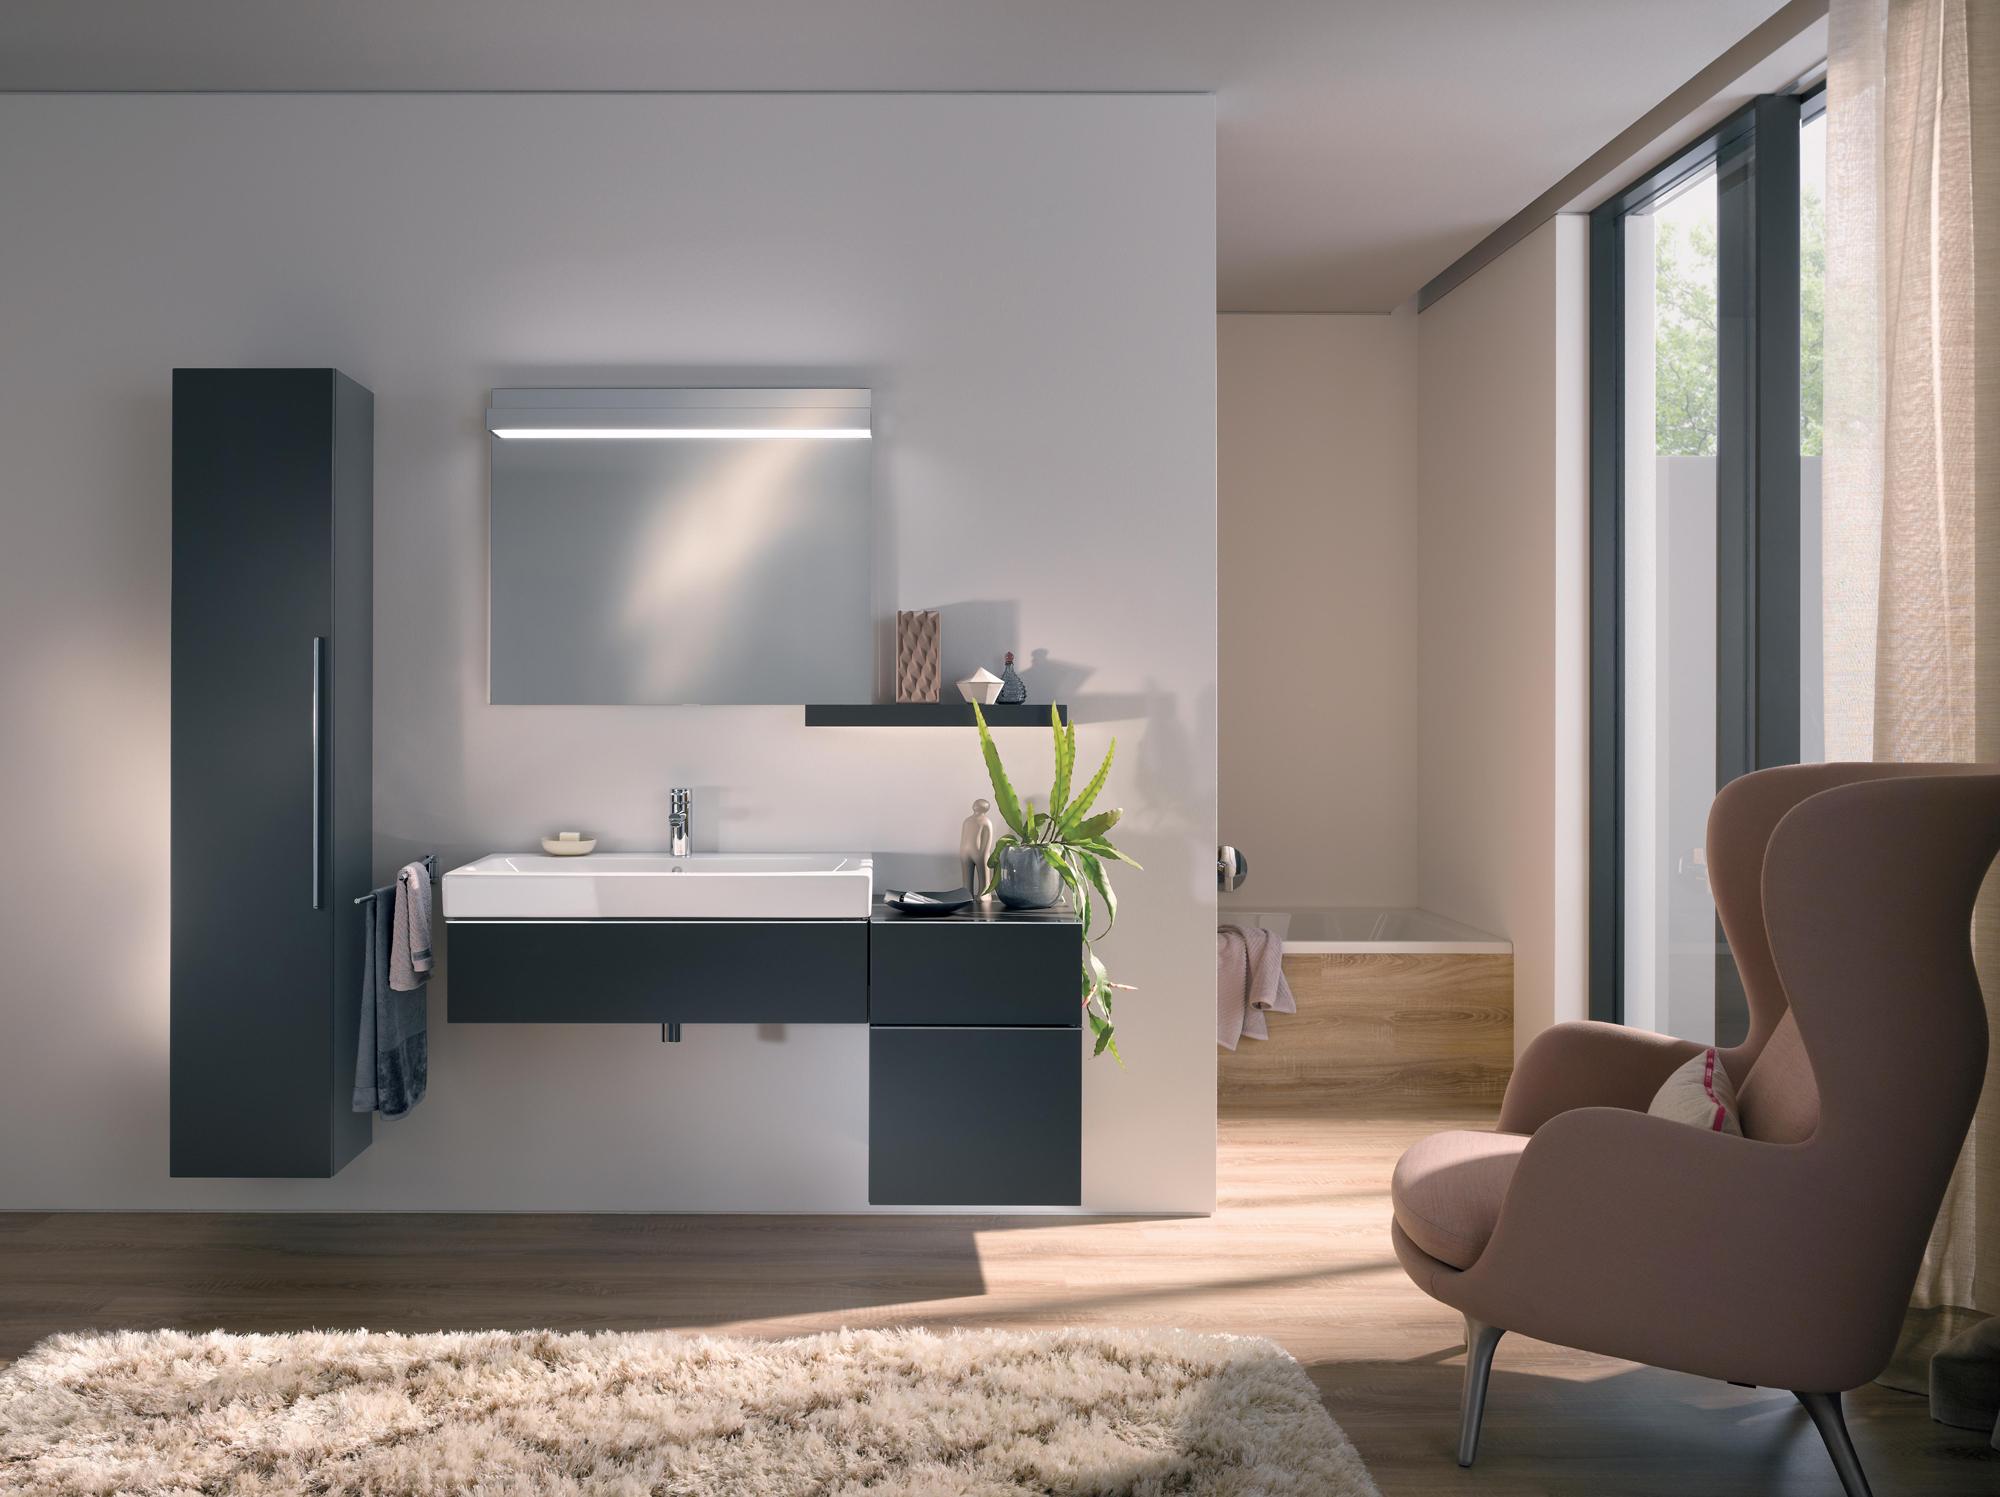 geberit keramag keramag badserien f r hohe anspr che an komfort und sthetik baudatenbank at. Black Bedroom Furniture Sets. Home Design Ideas